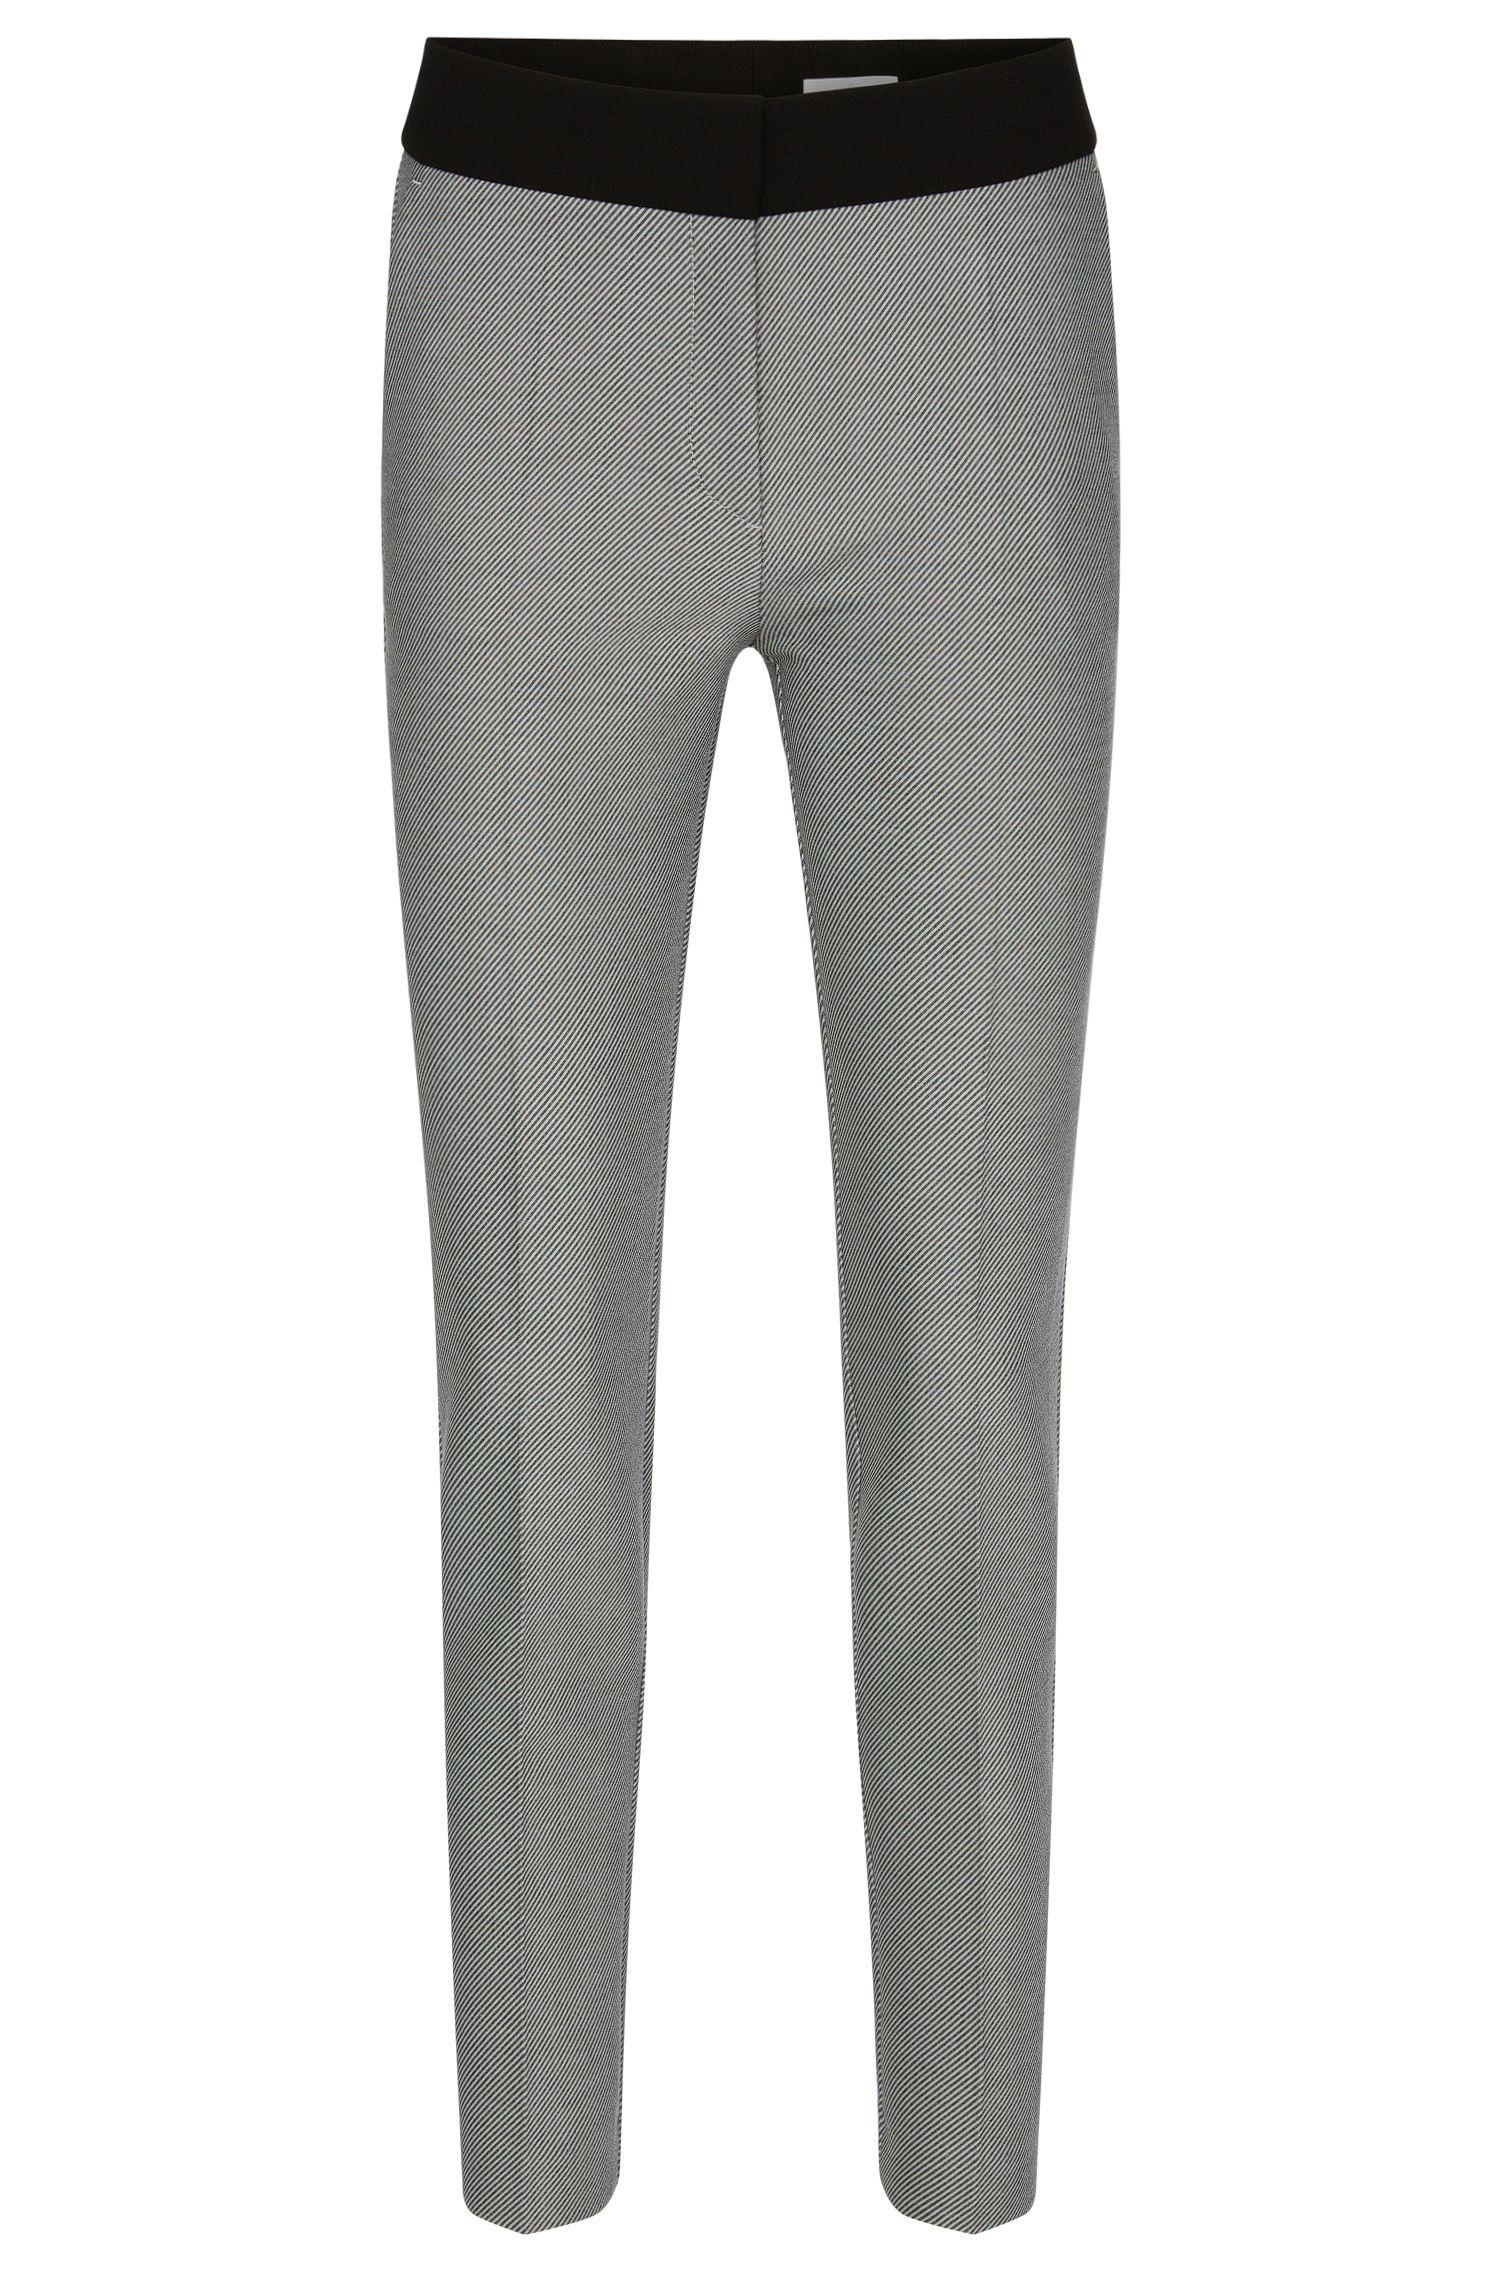 'Acnella' | Stretch Contrast Twill Stripe Dress Pants